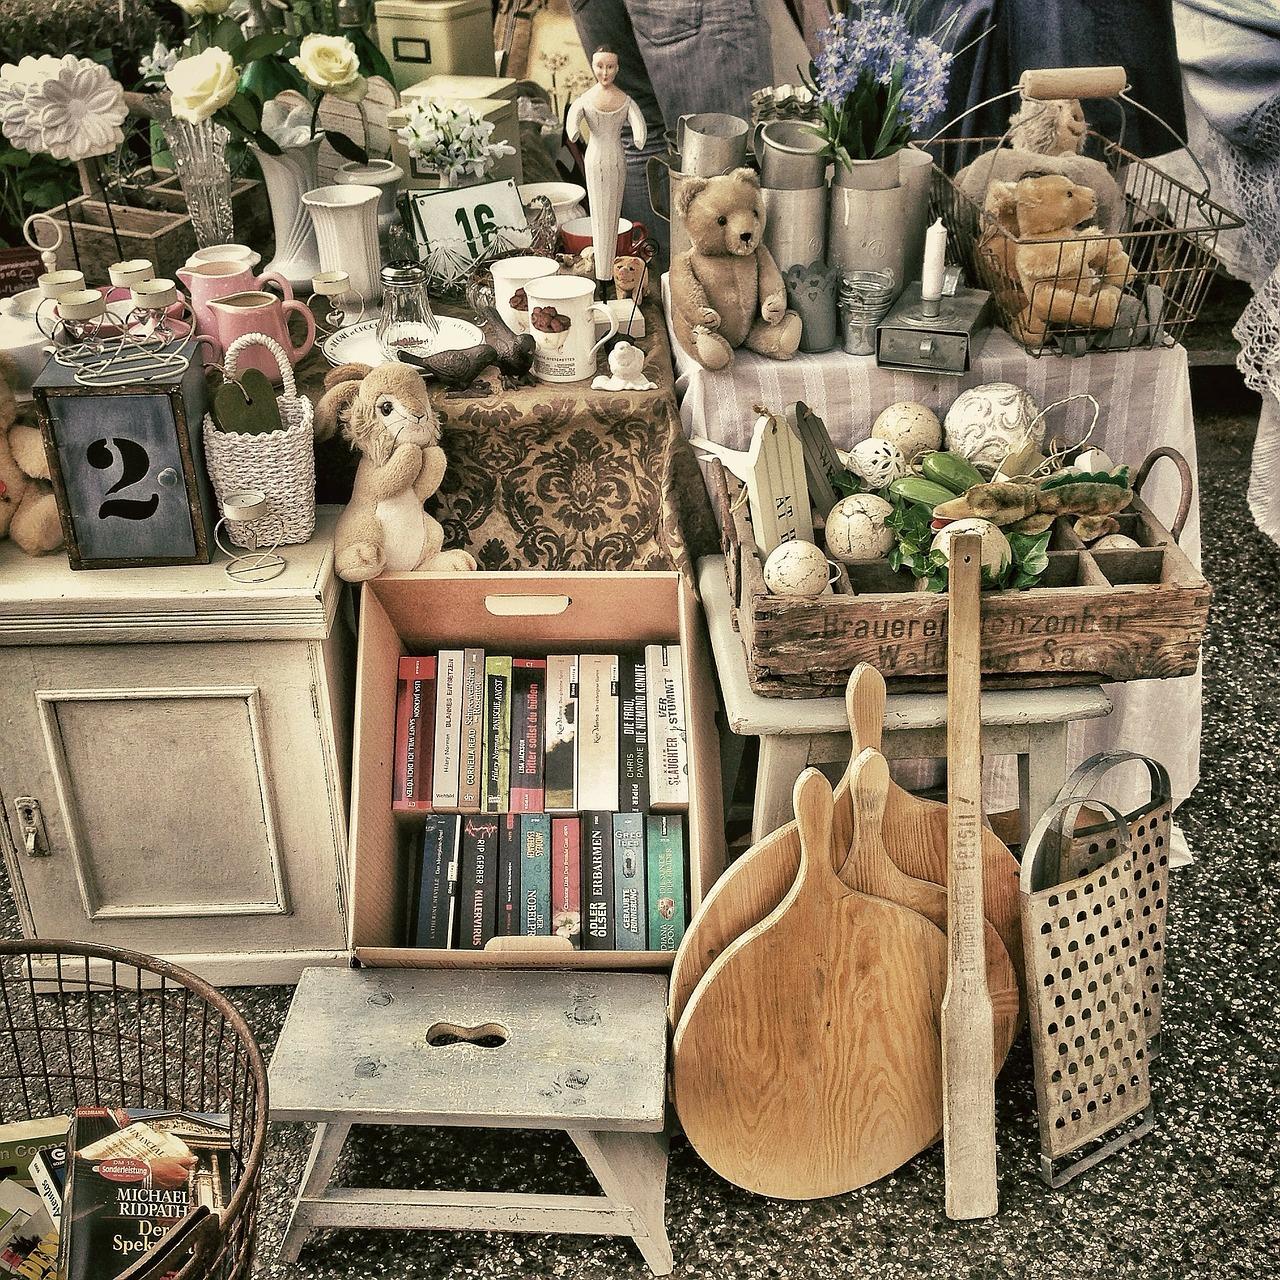 flea-market-343123_1280.jpg